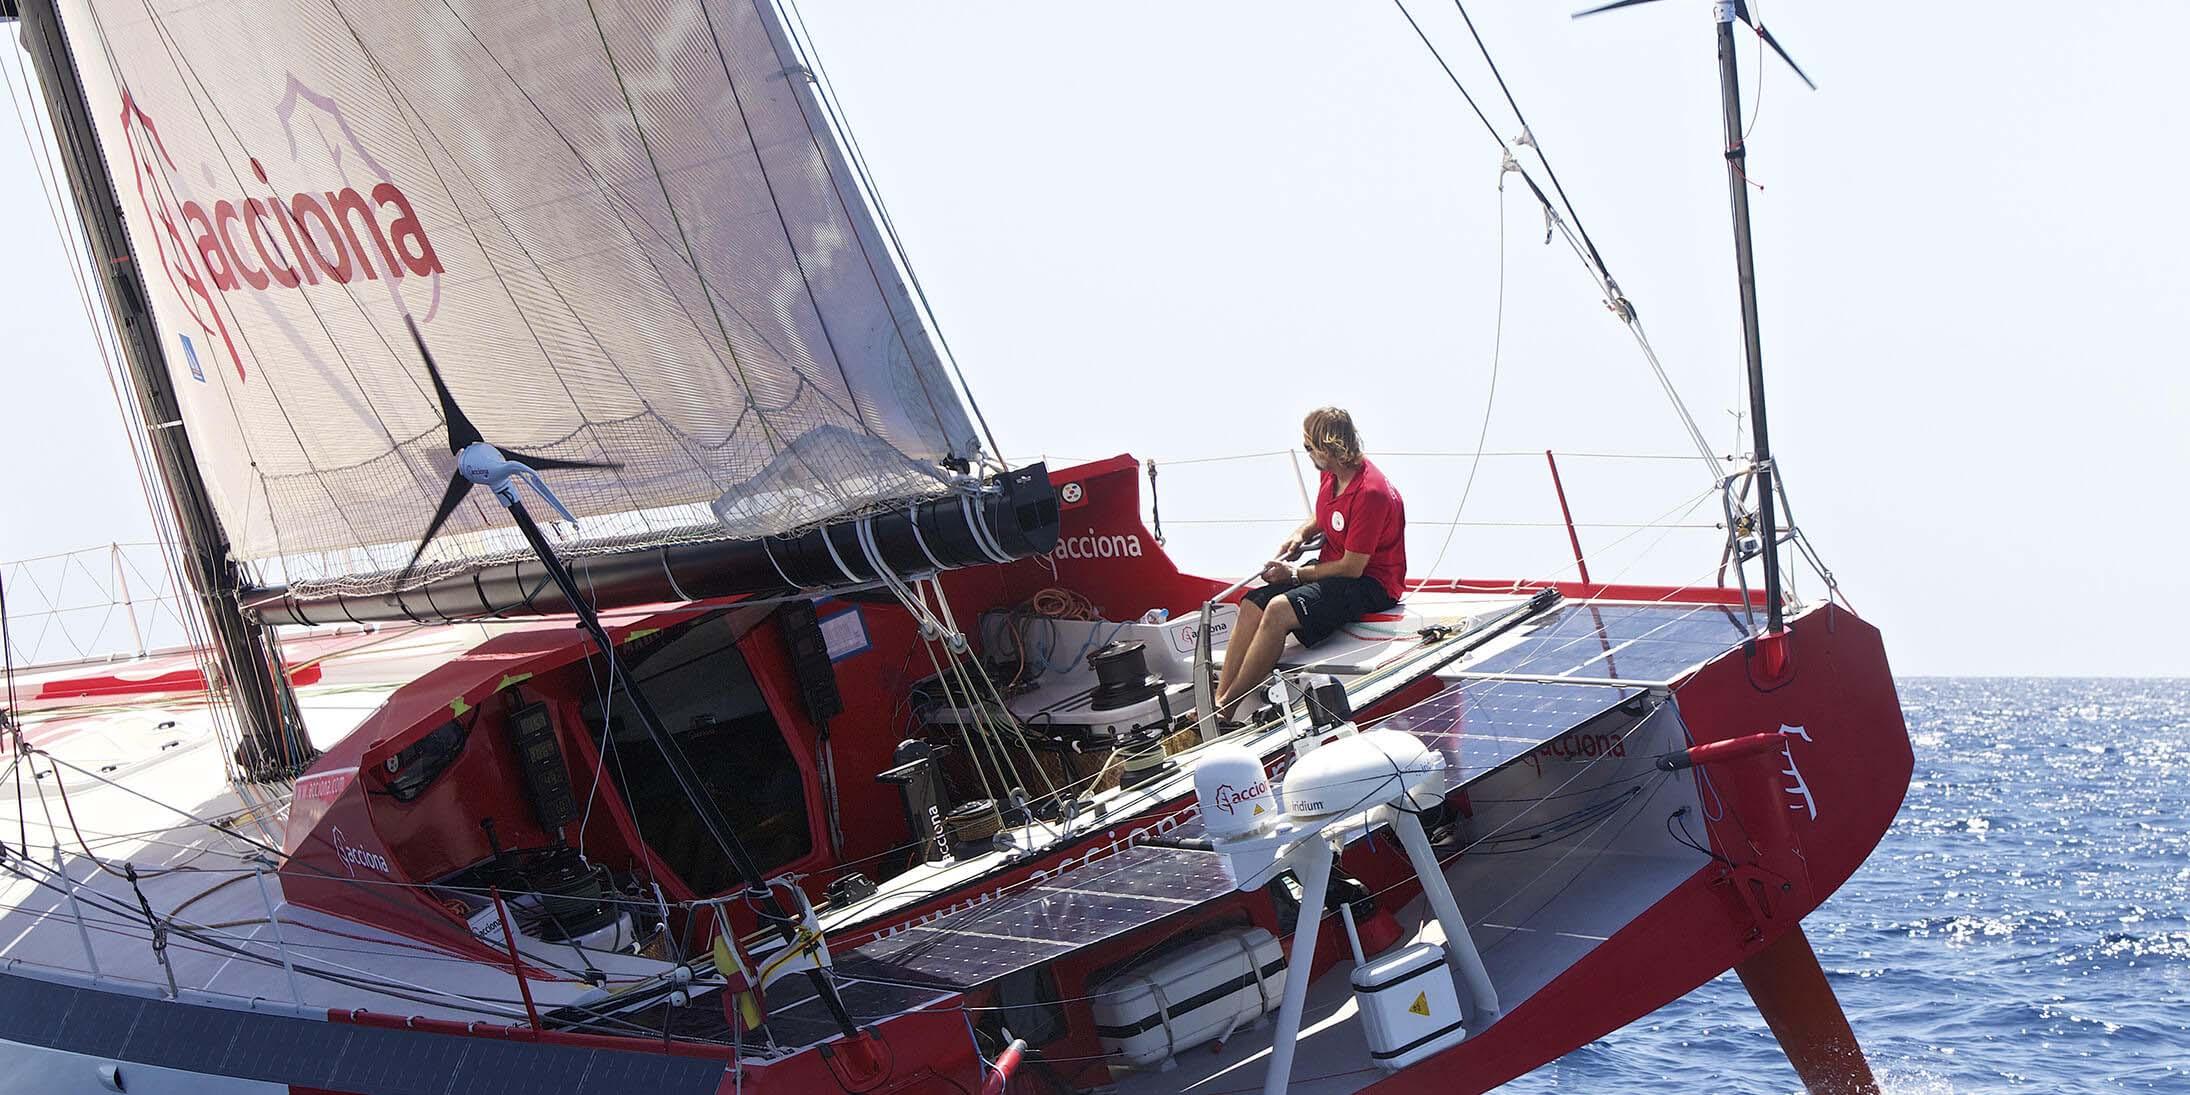 A Zero Emission Sailboat At The Vendee Globe Acciona Business As Unusual